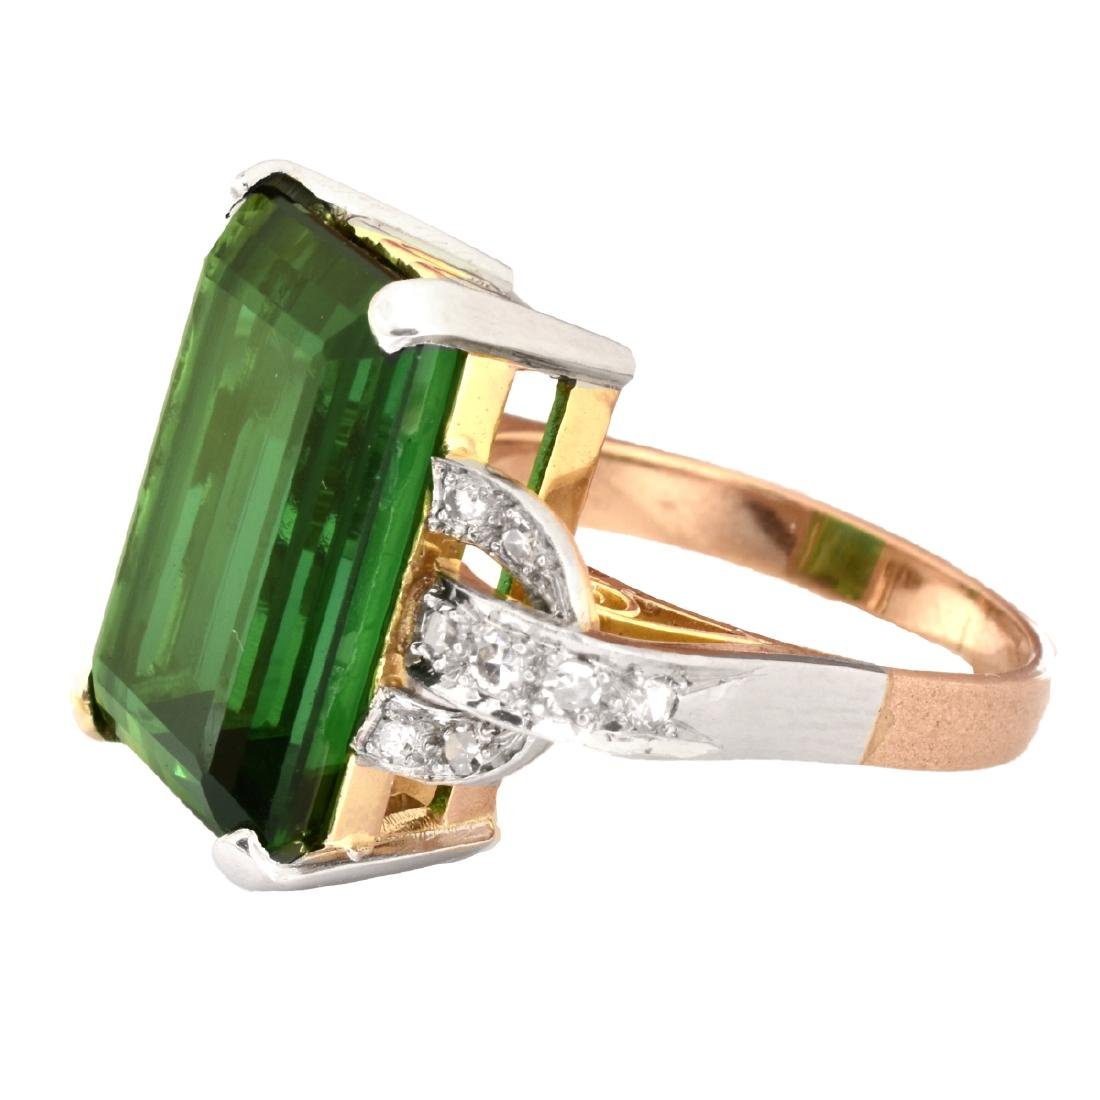 French Tourmaline, Diamond and 18K Gold Ring - 3